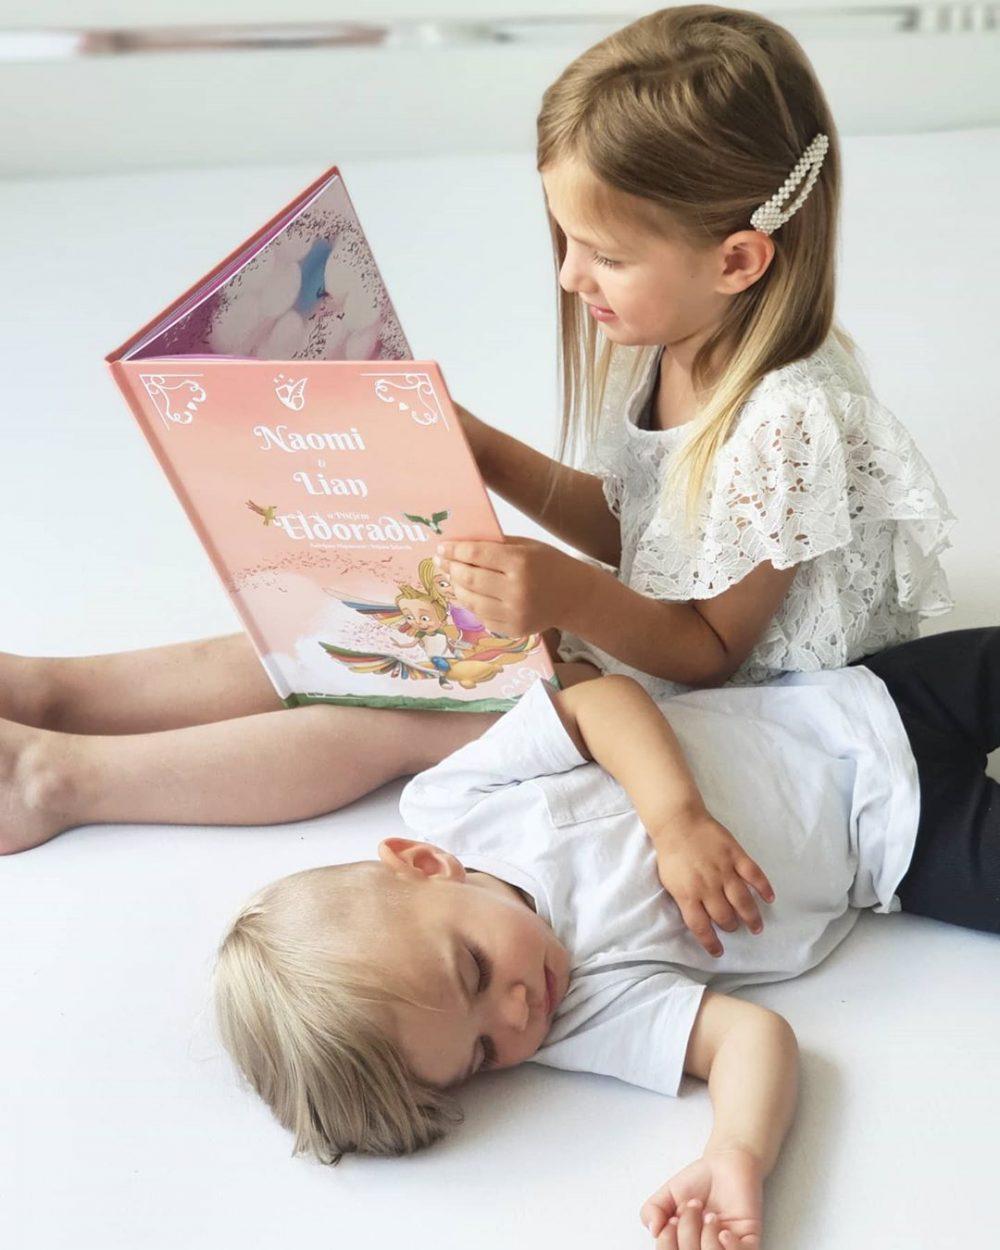 dvoje djece s knjigom Ptičji Eldorado